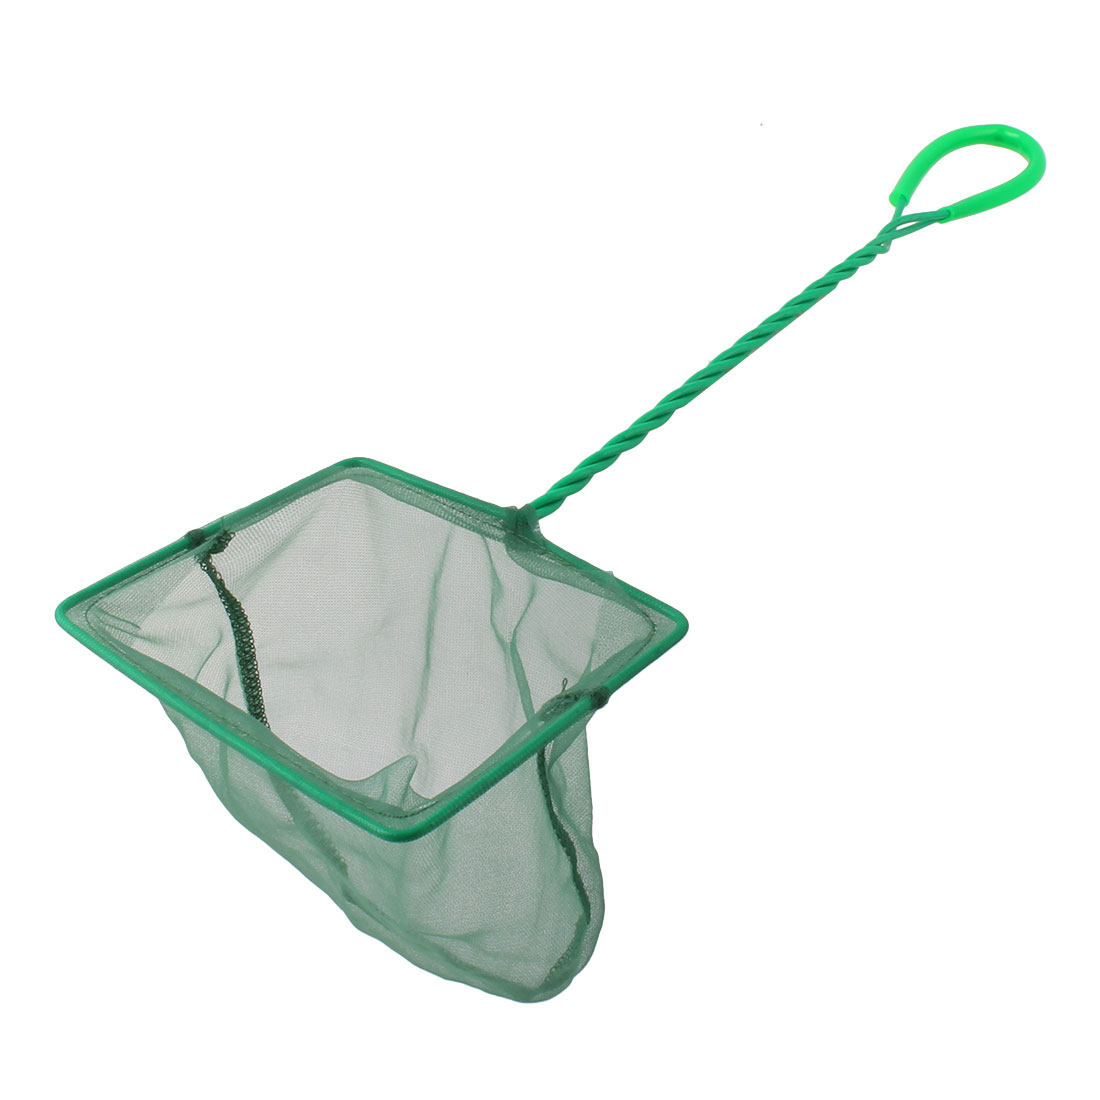 Aquarium Fish Tank Nylon Nonslip Rectangular Shaped Long Handle Mesh Fishing Net Green